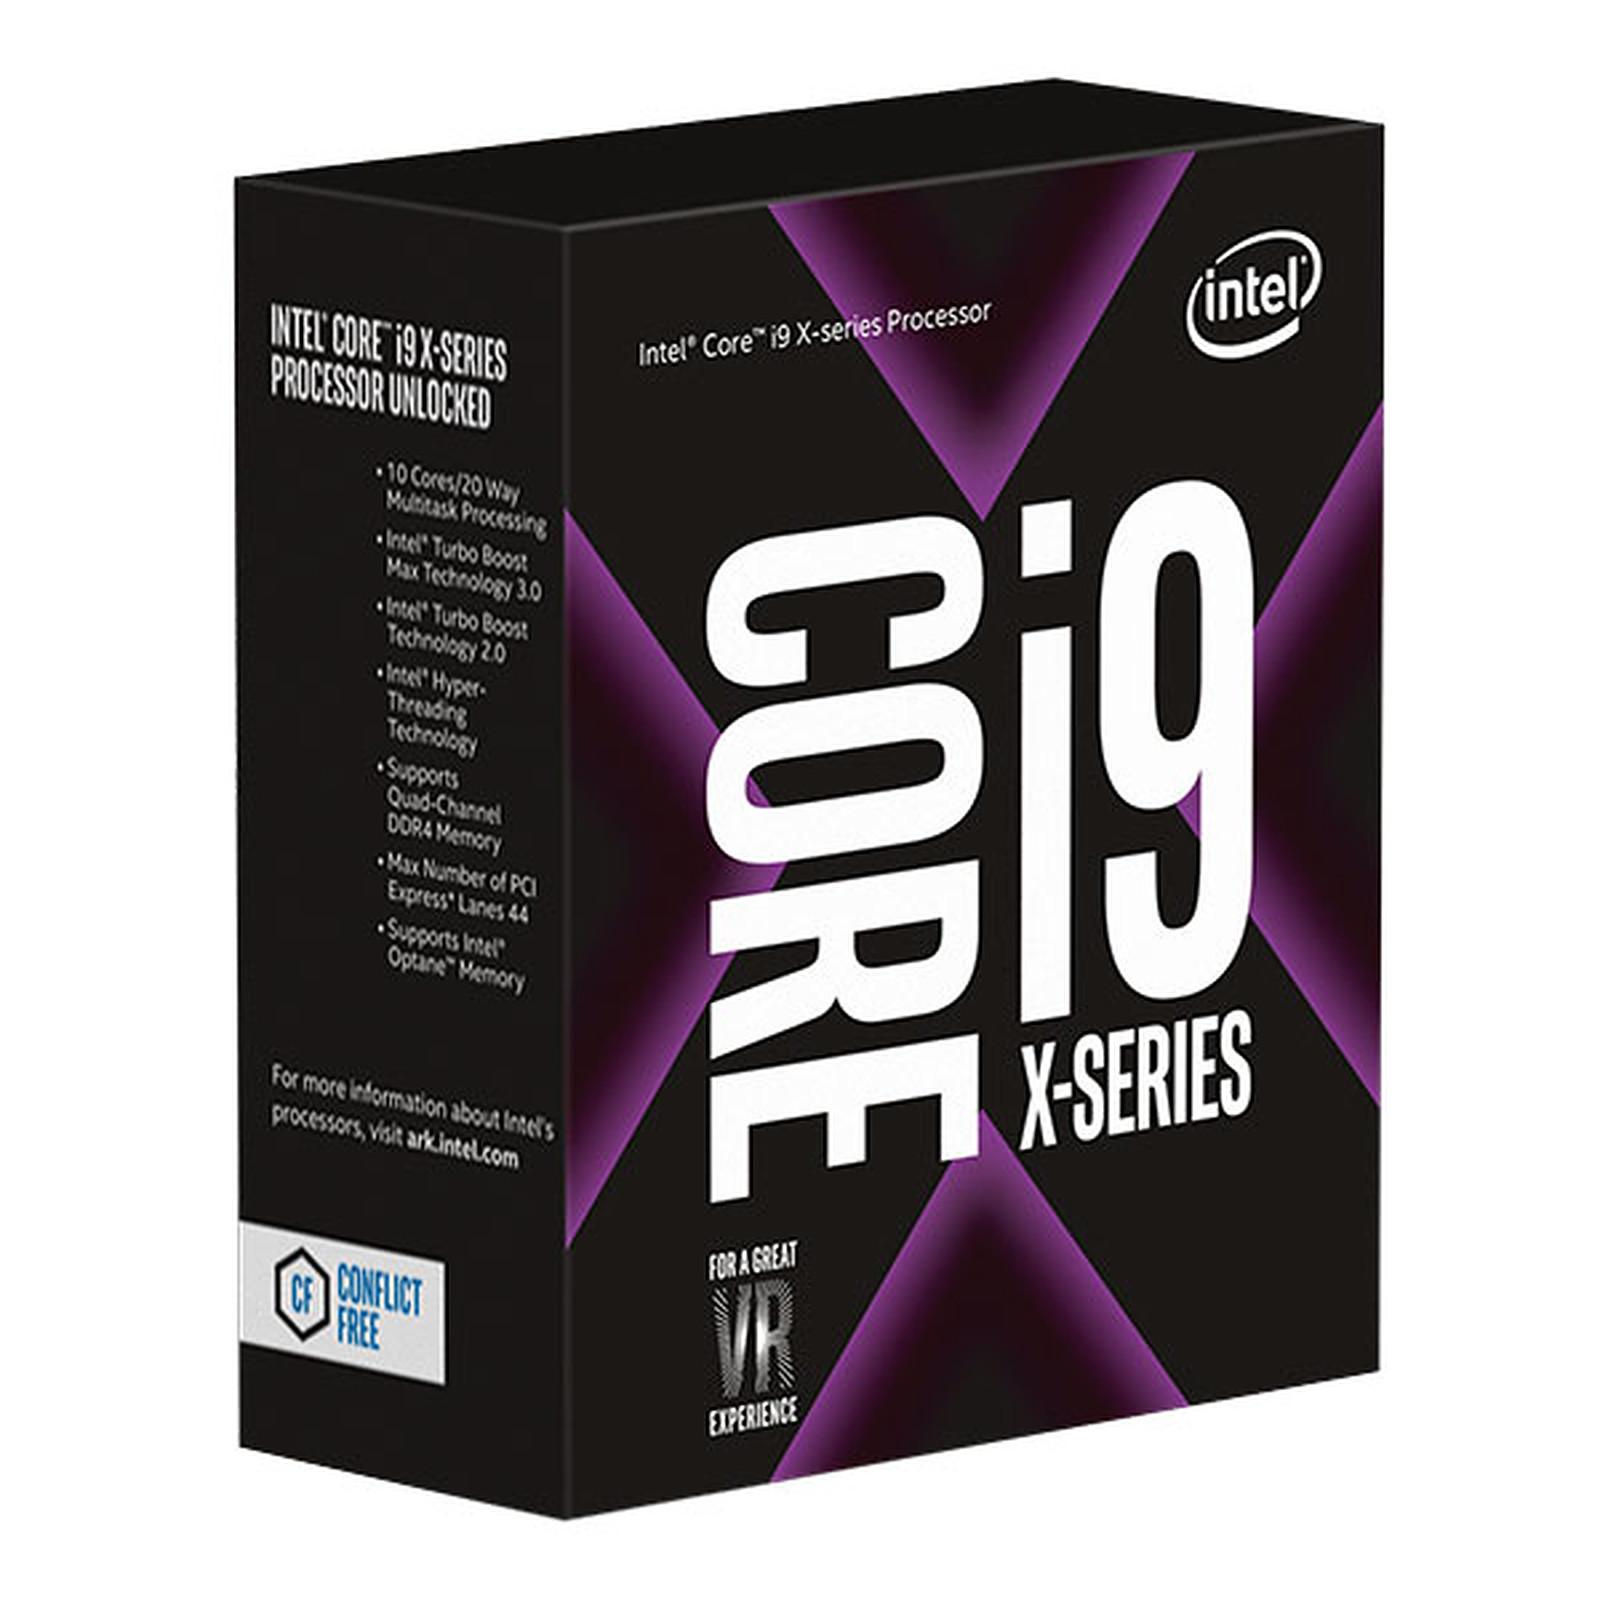 Intel Core i9-7900X (3.3 GHz)